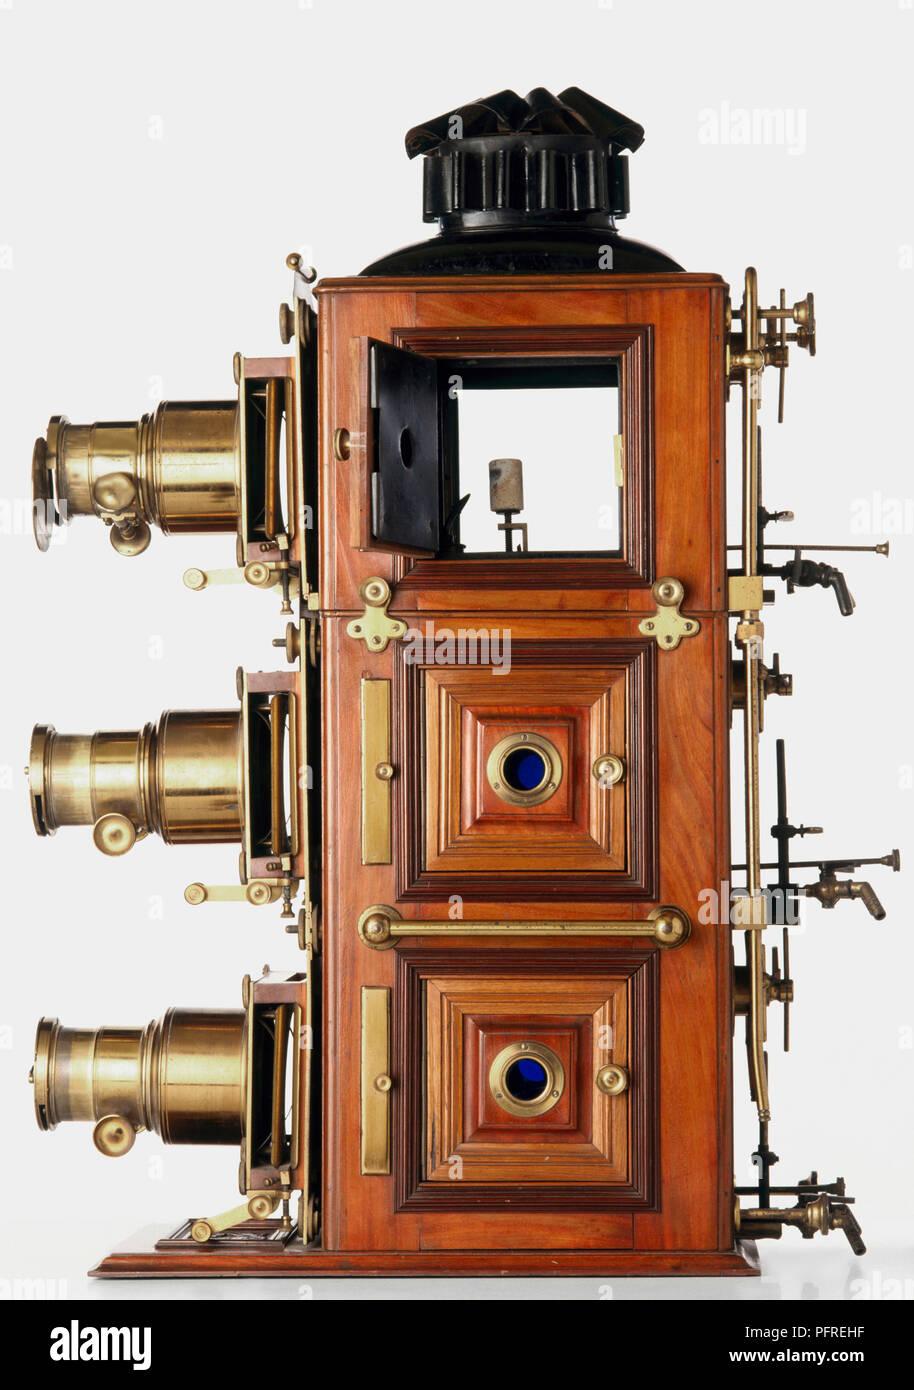 Triunial triple lantern, 19th-century - Stock Image